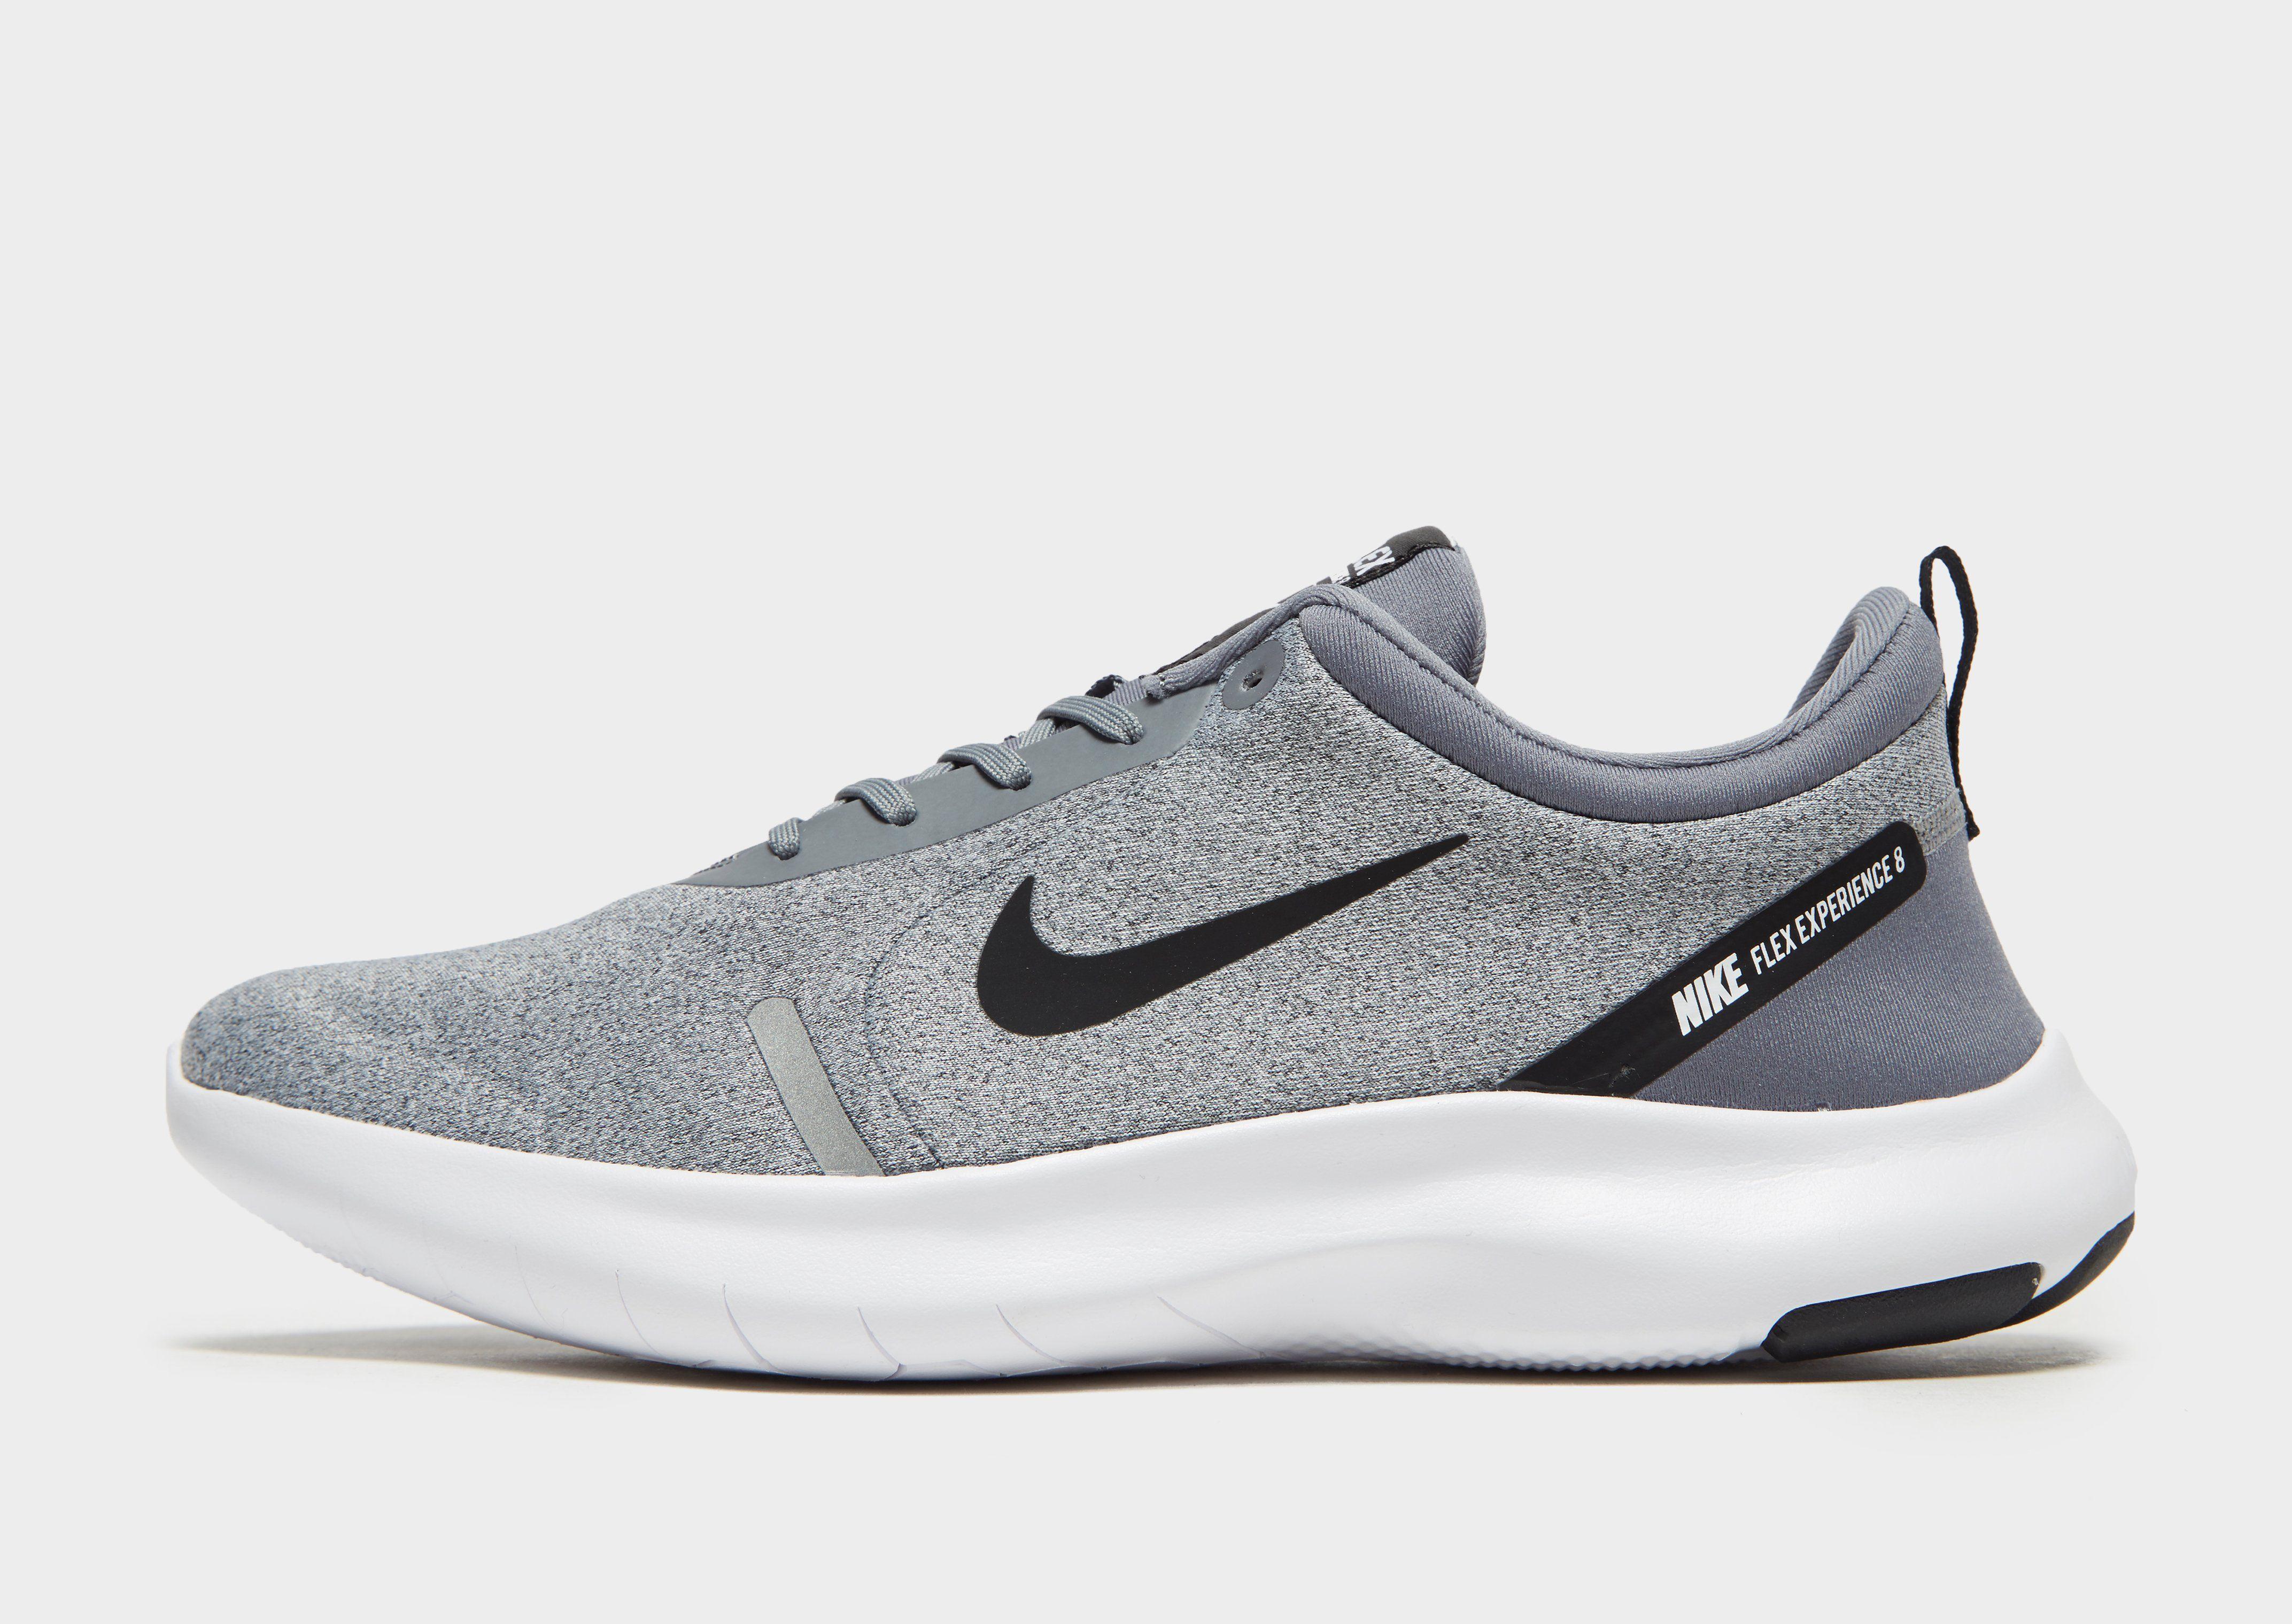 df1bca5a74f10 Nike Flex Experience RN 8